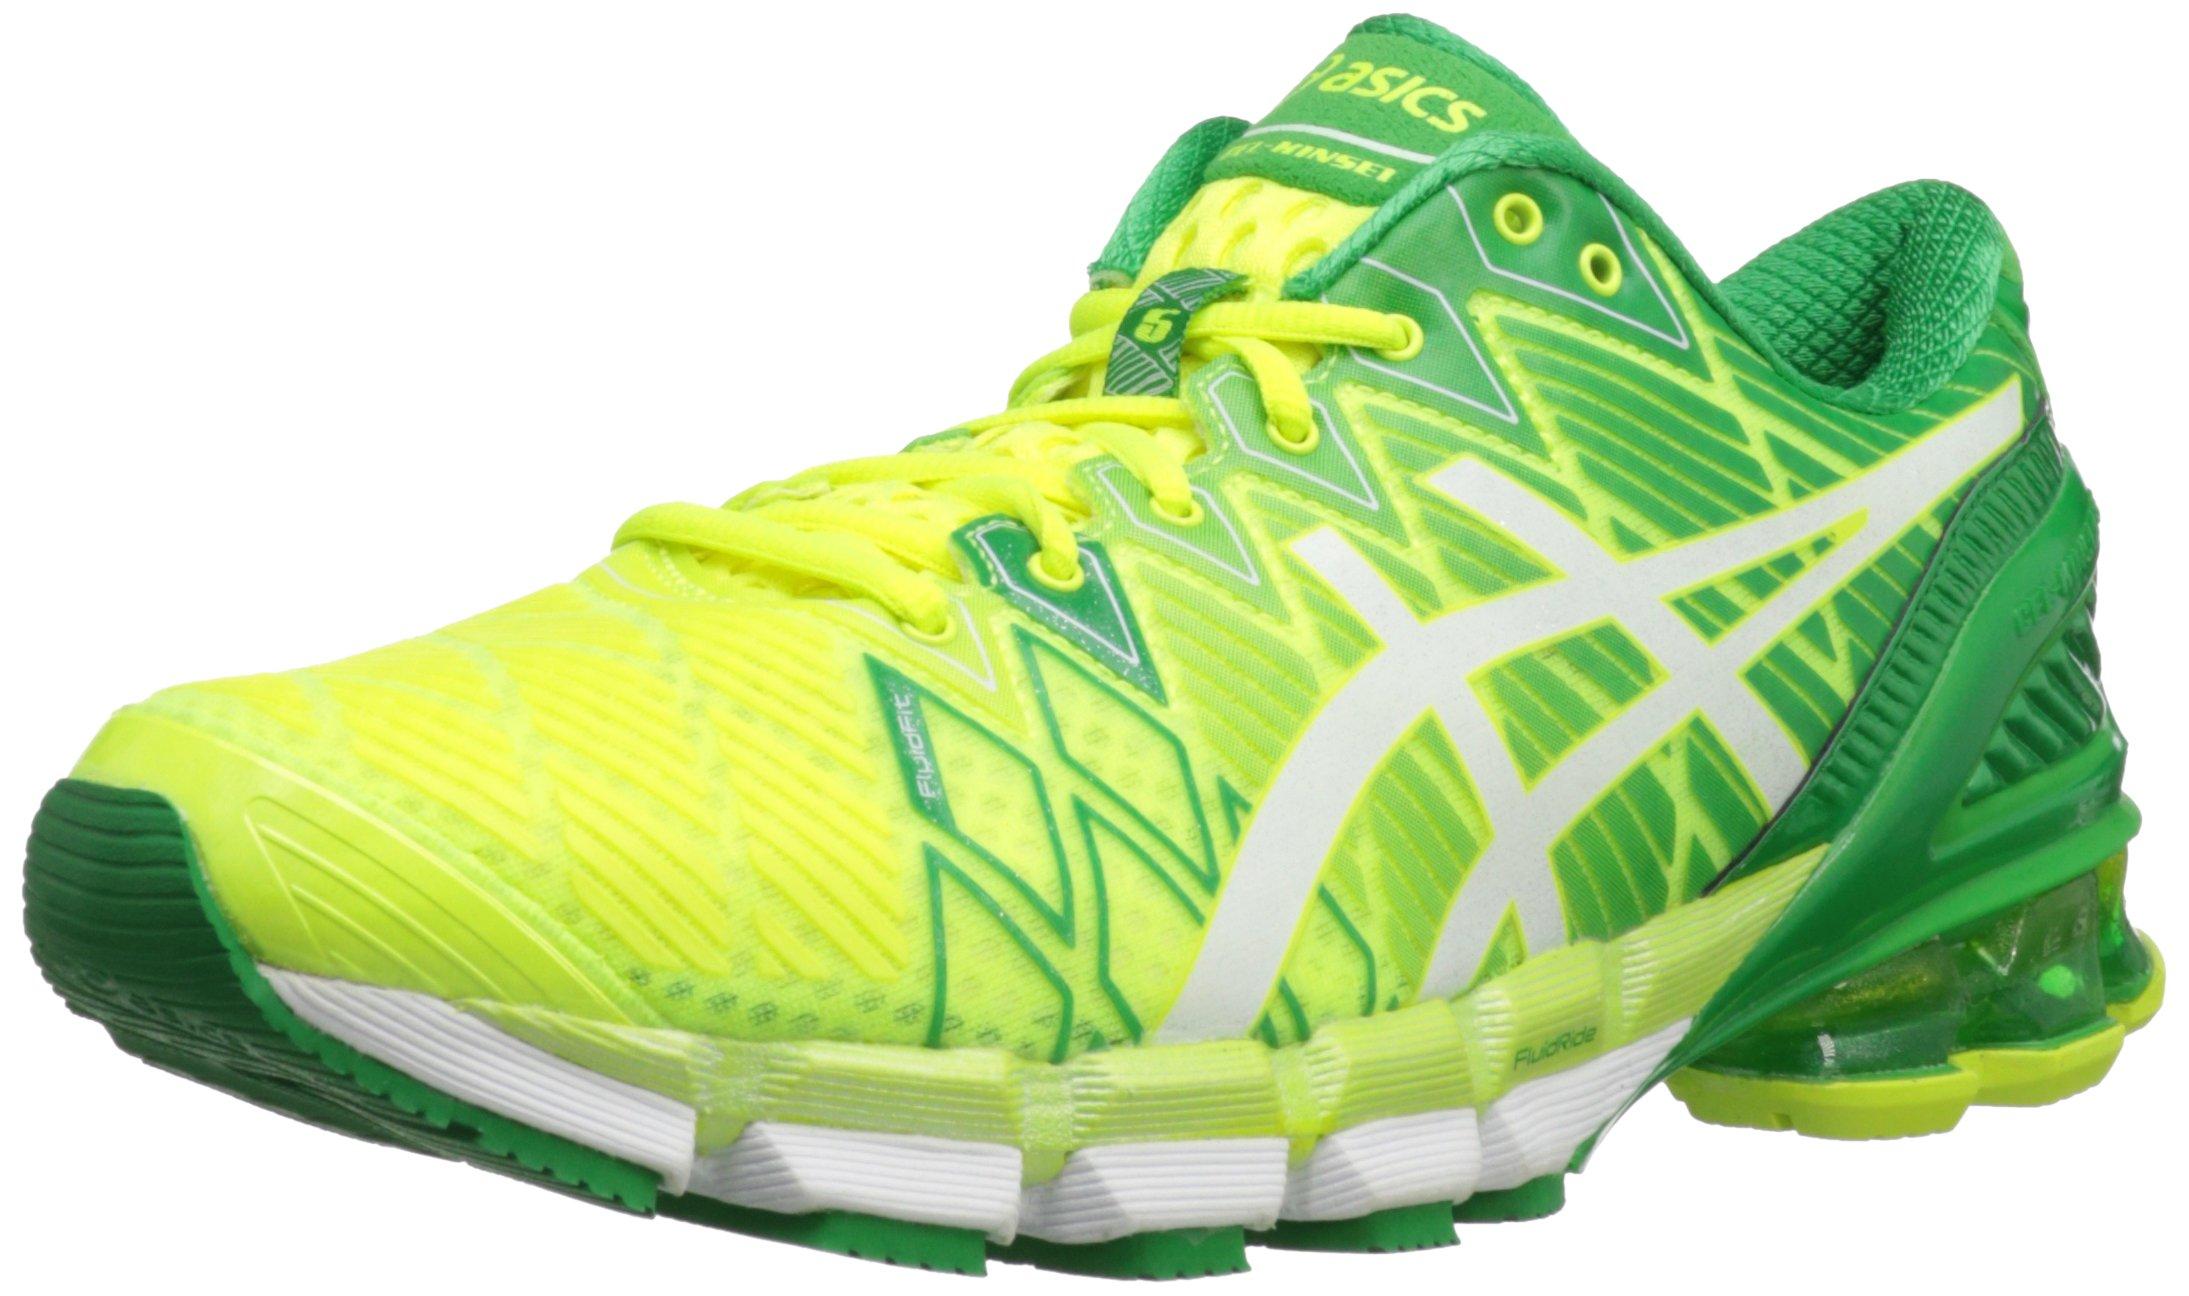 size 40 5d2bd f7355 Galleon - ASICS Men s Gel-Kinsei 5 Running Shoe,Flash Yellow White Green,9.5  M US